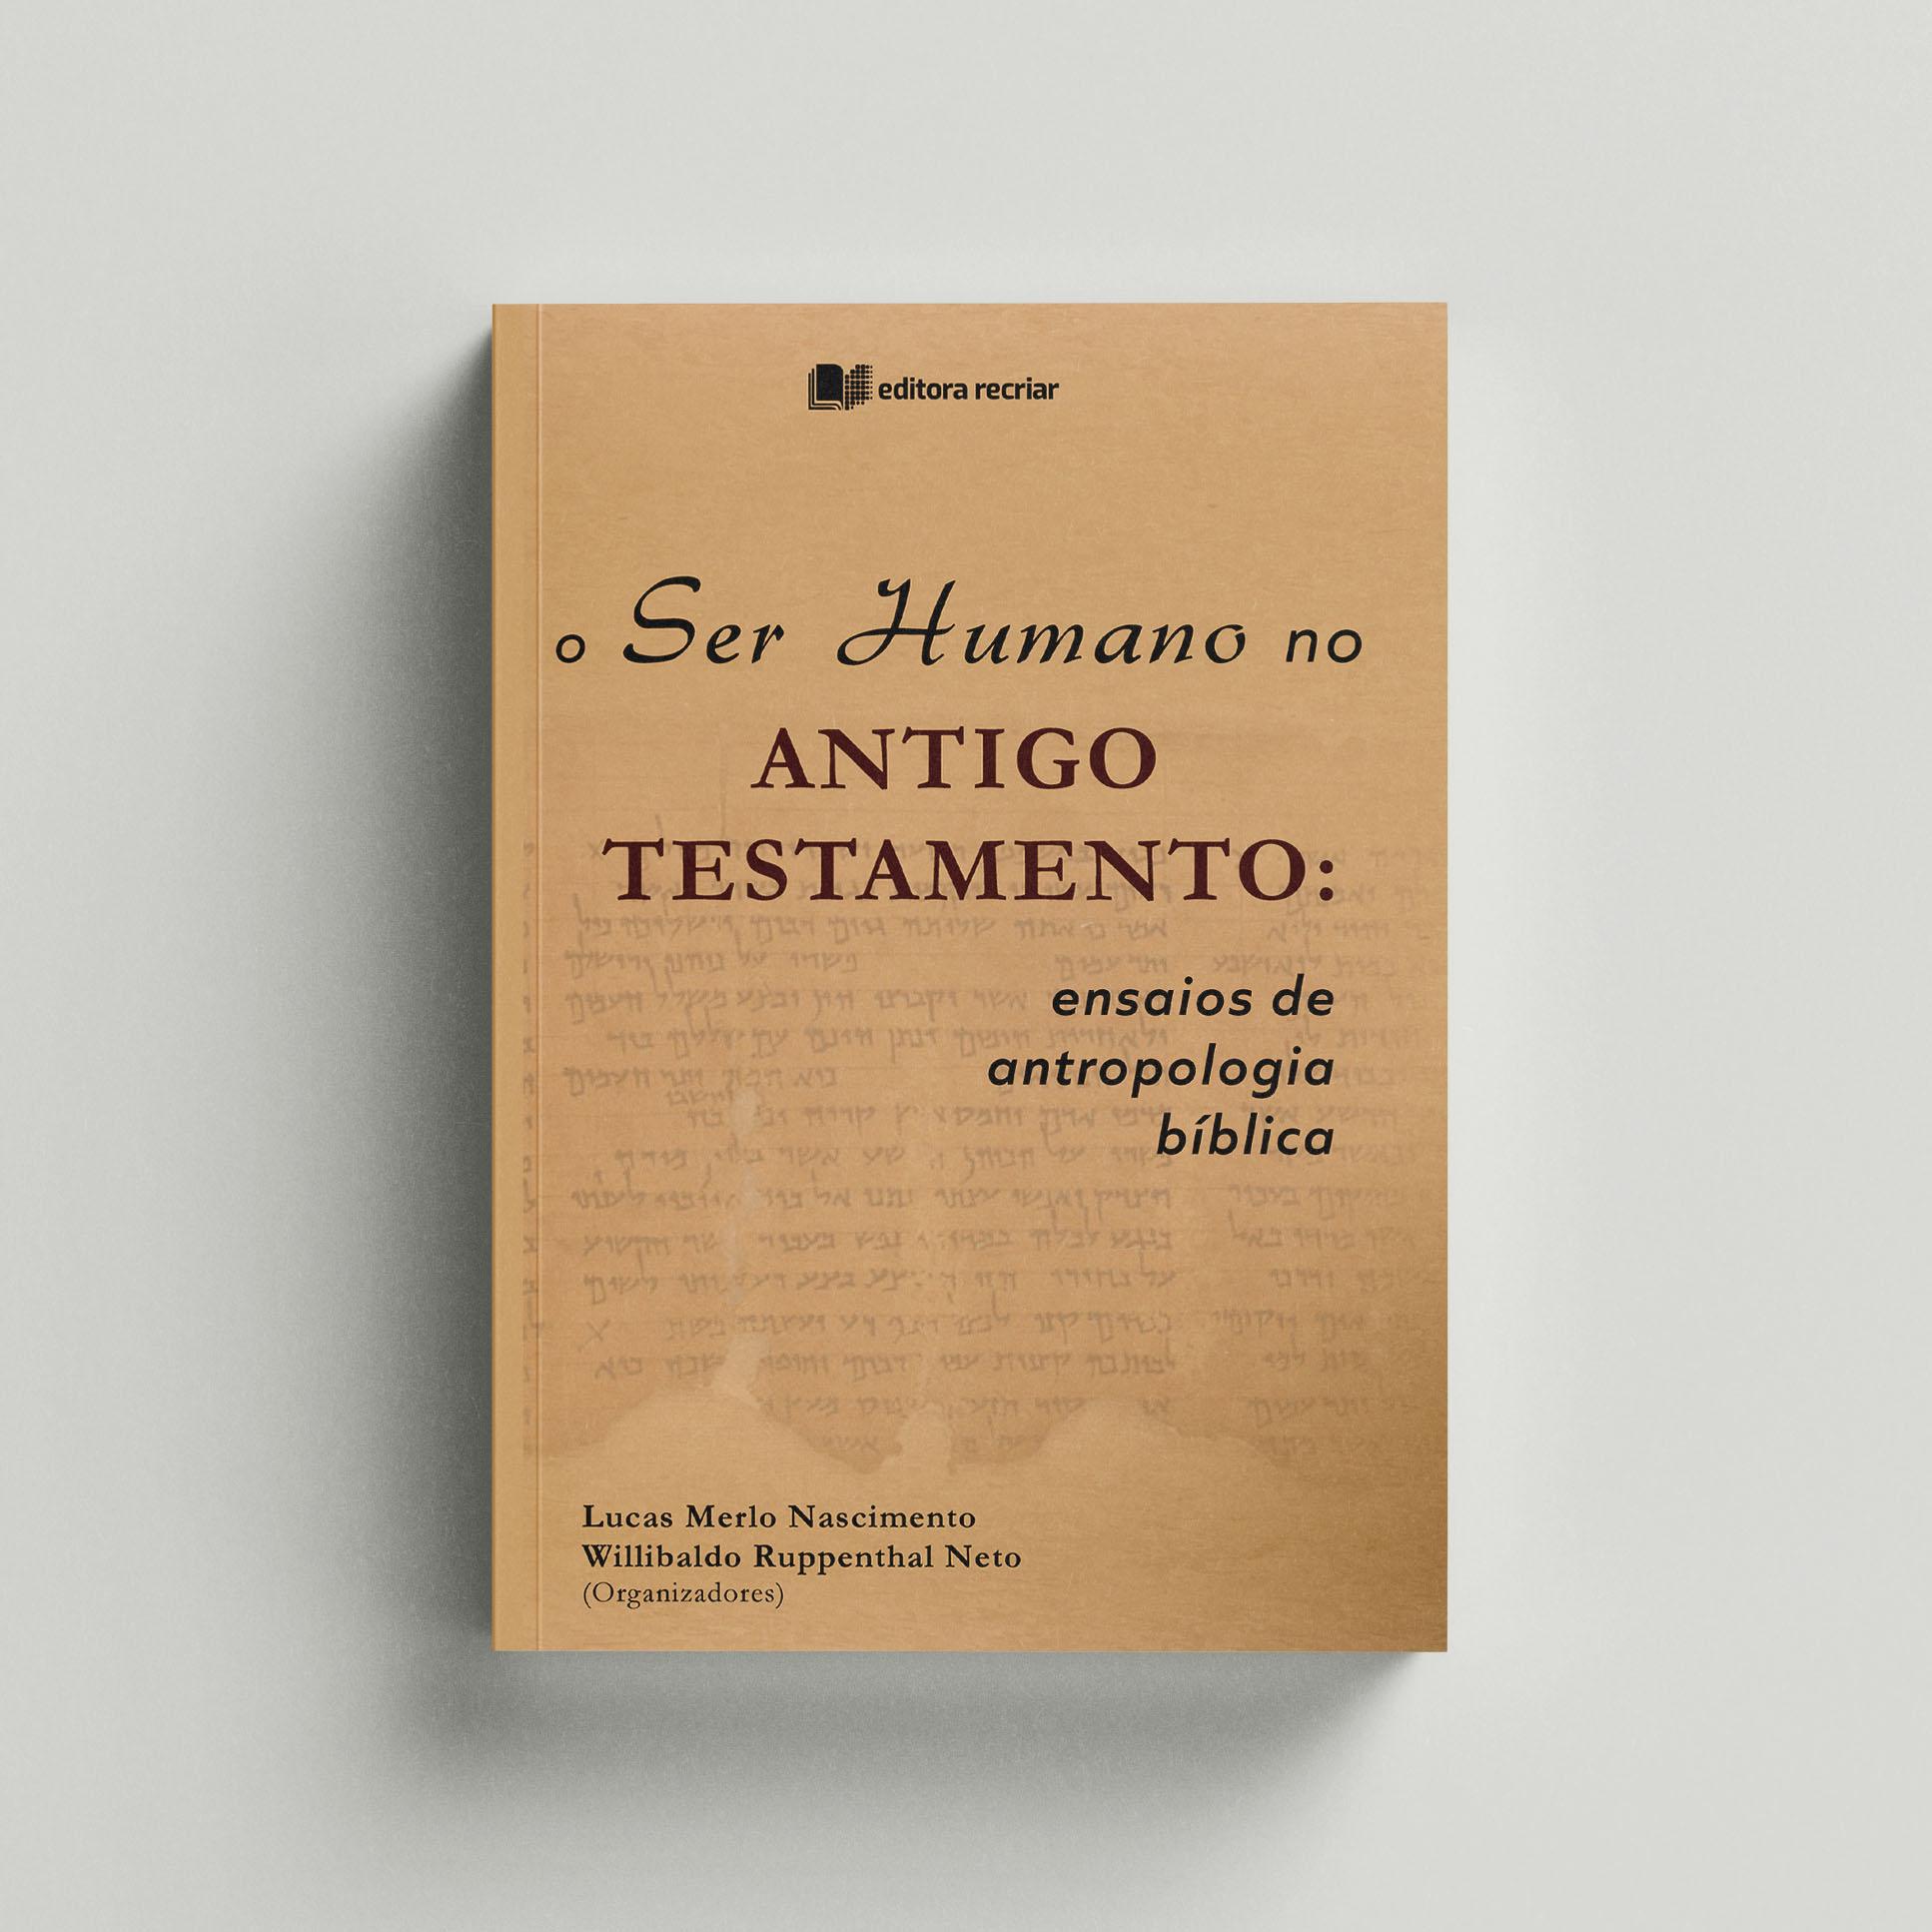 O ser humano no Antigo Testamento - Lucas Merlo; Willibaldo Neto